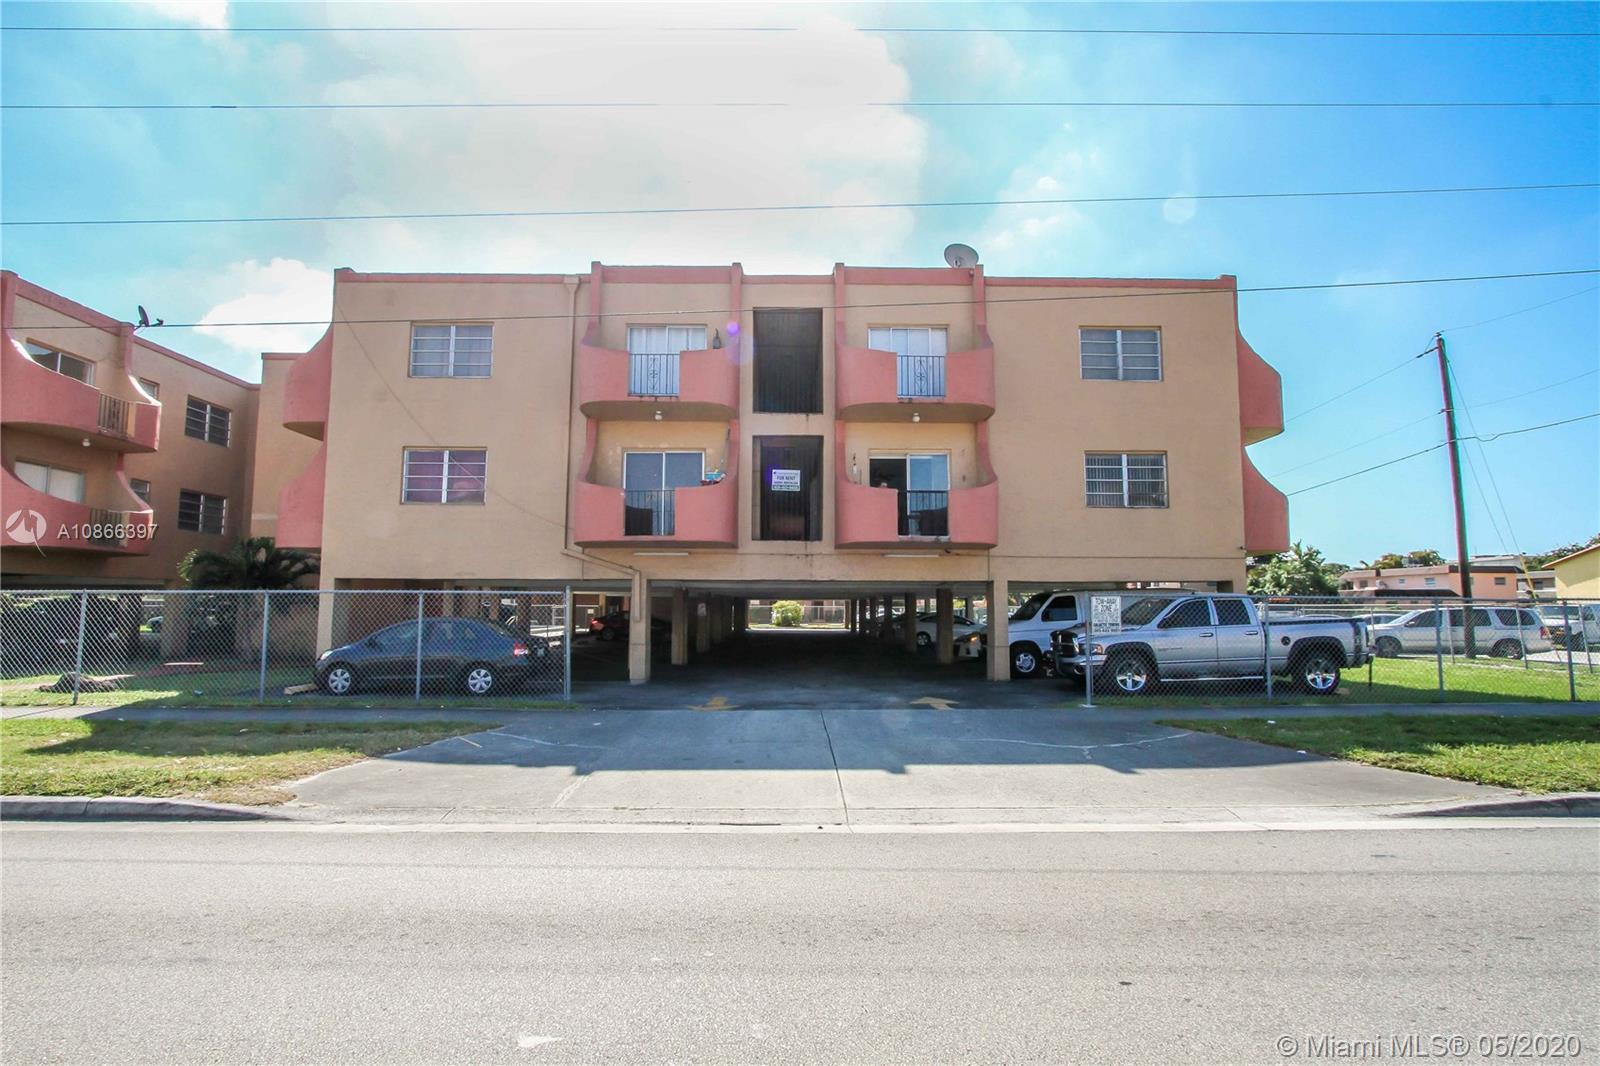 3675 W 11th Ave 314, Hialeah, FL 33012